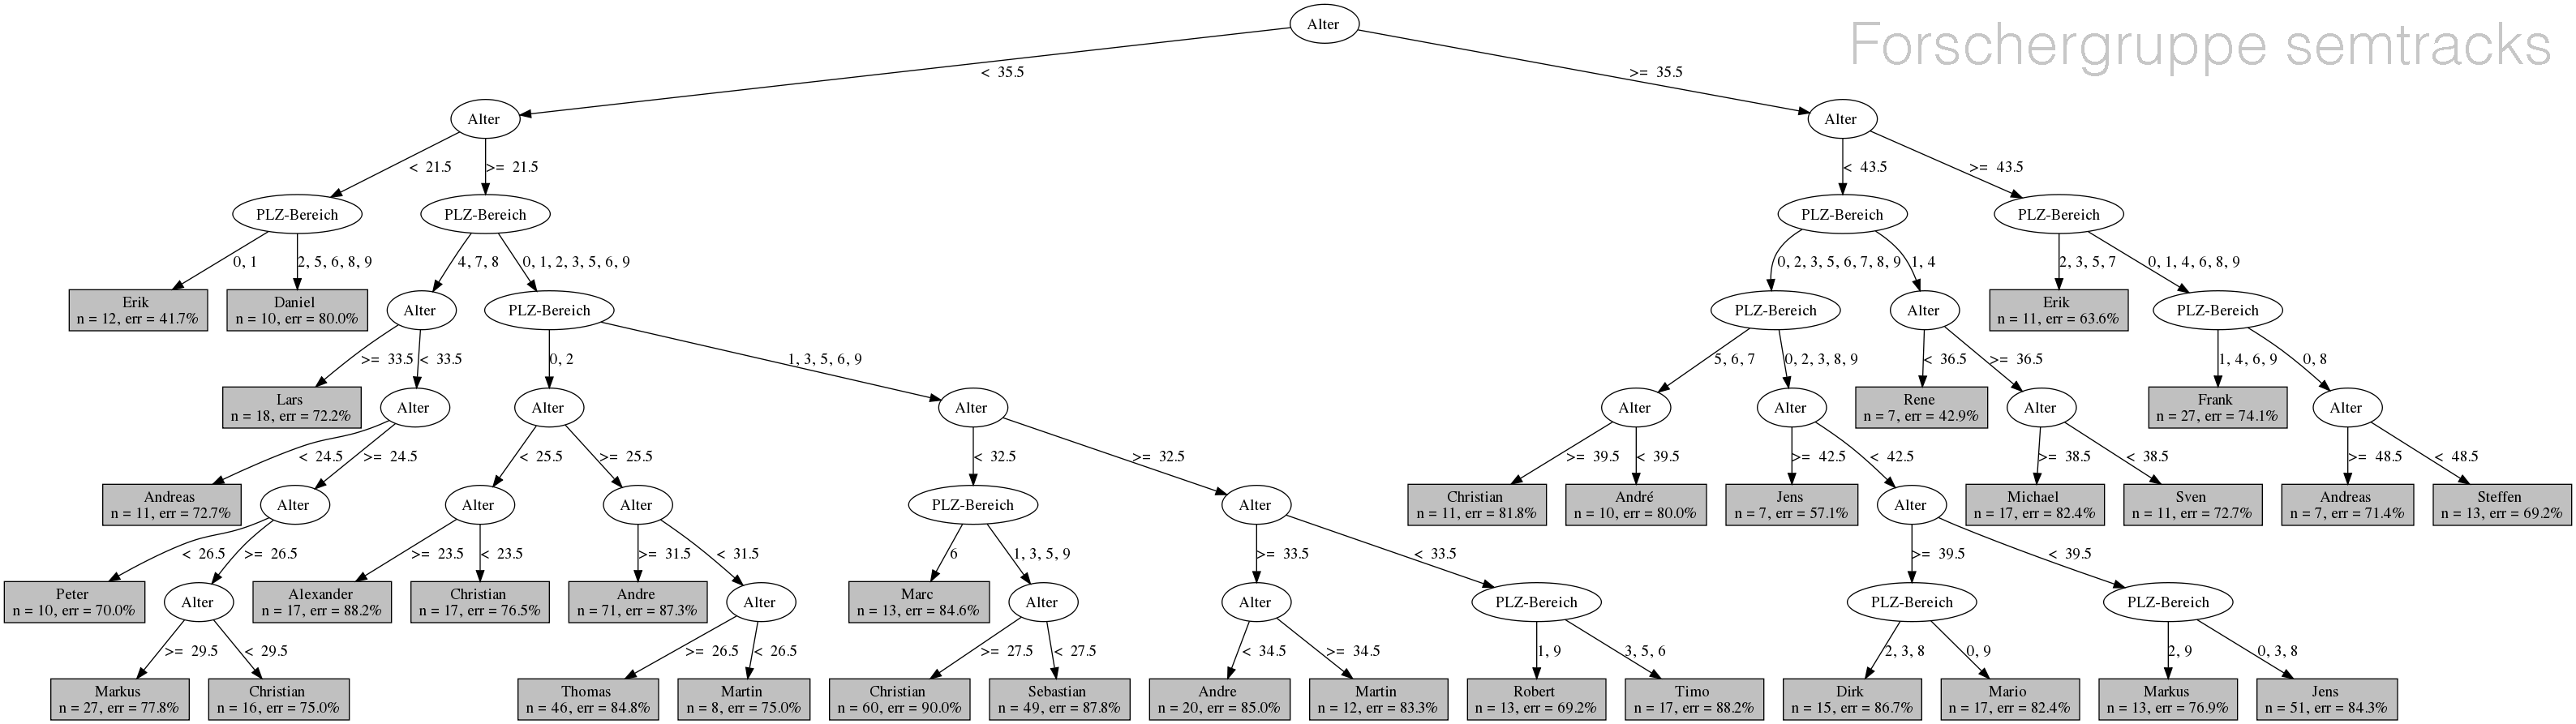 decision tree: nazivornamen ~ alter + plz_raum (minsplit 20, maxdepth 7)